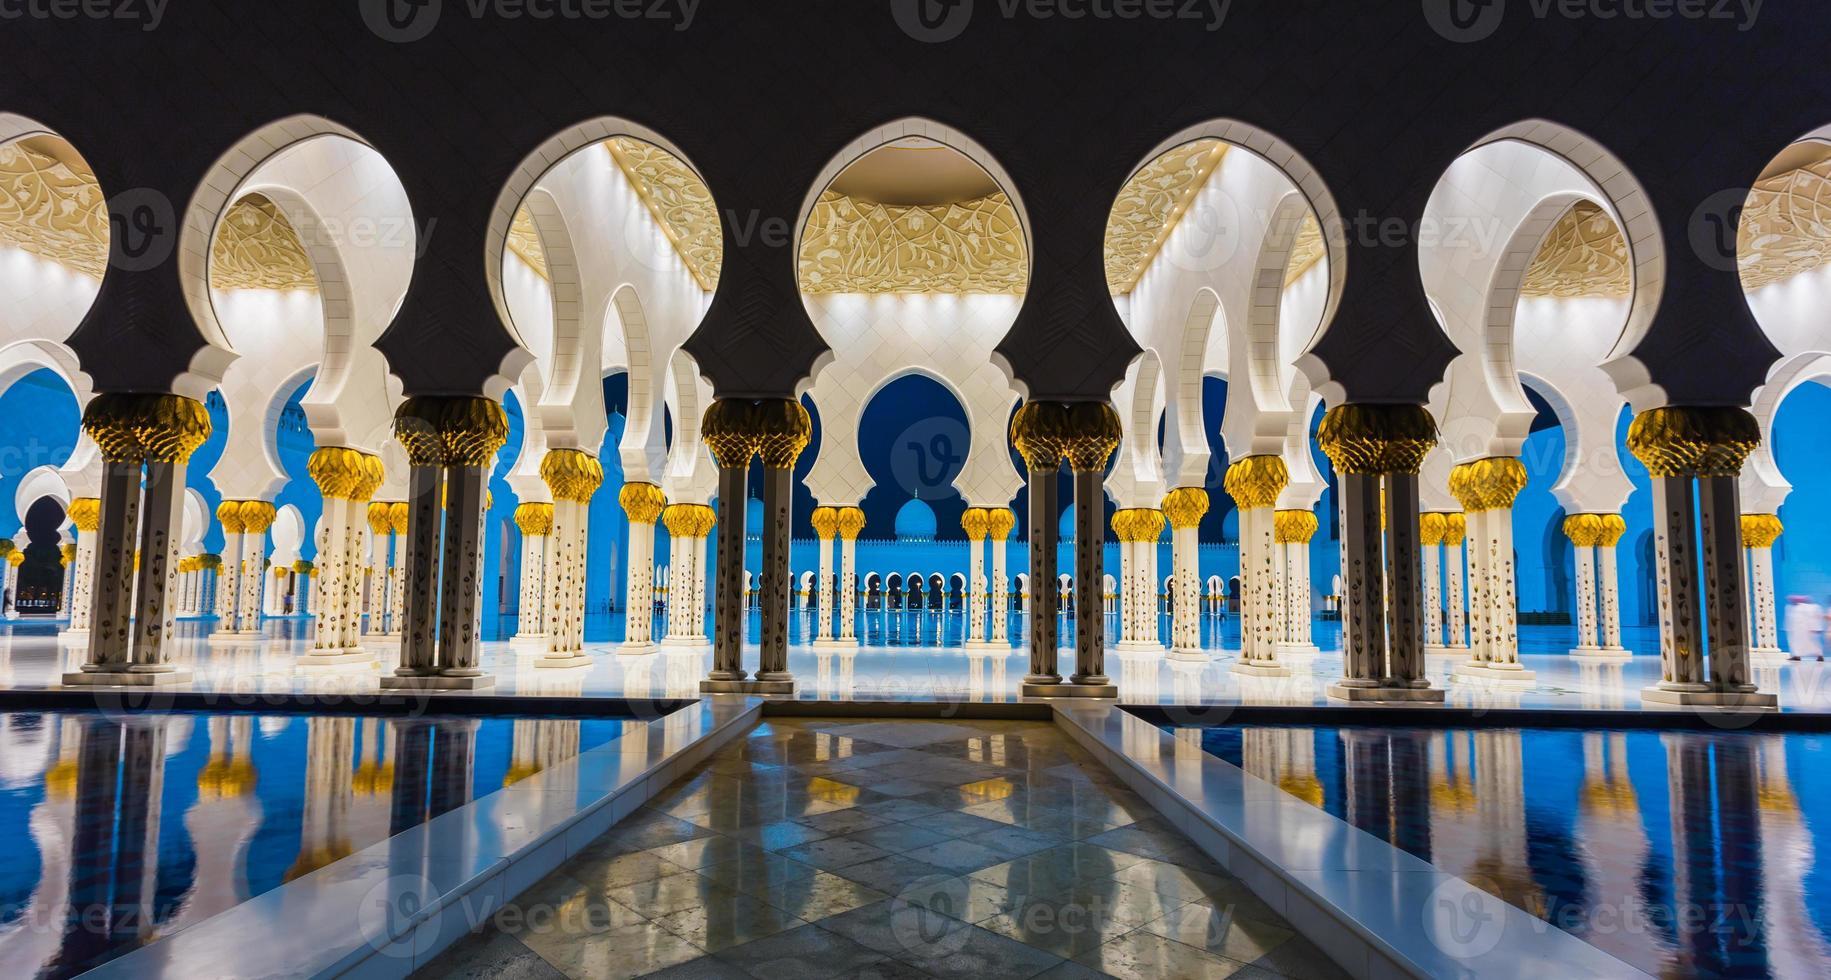 de shaikh zayed-moskee foto